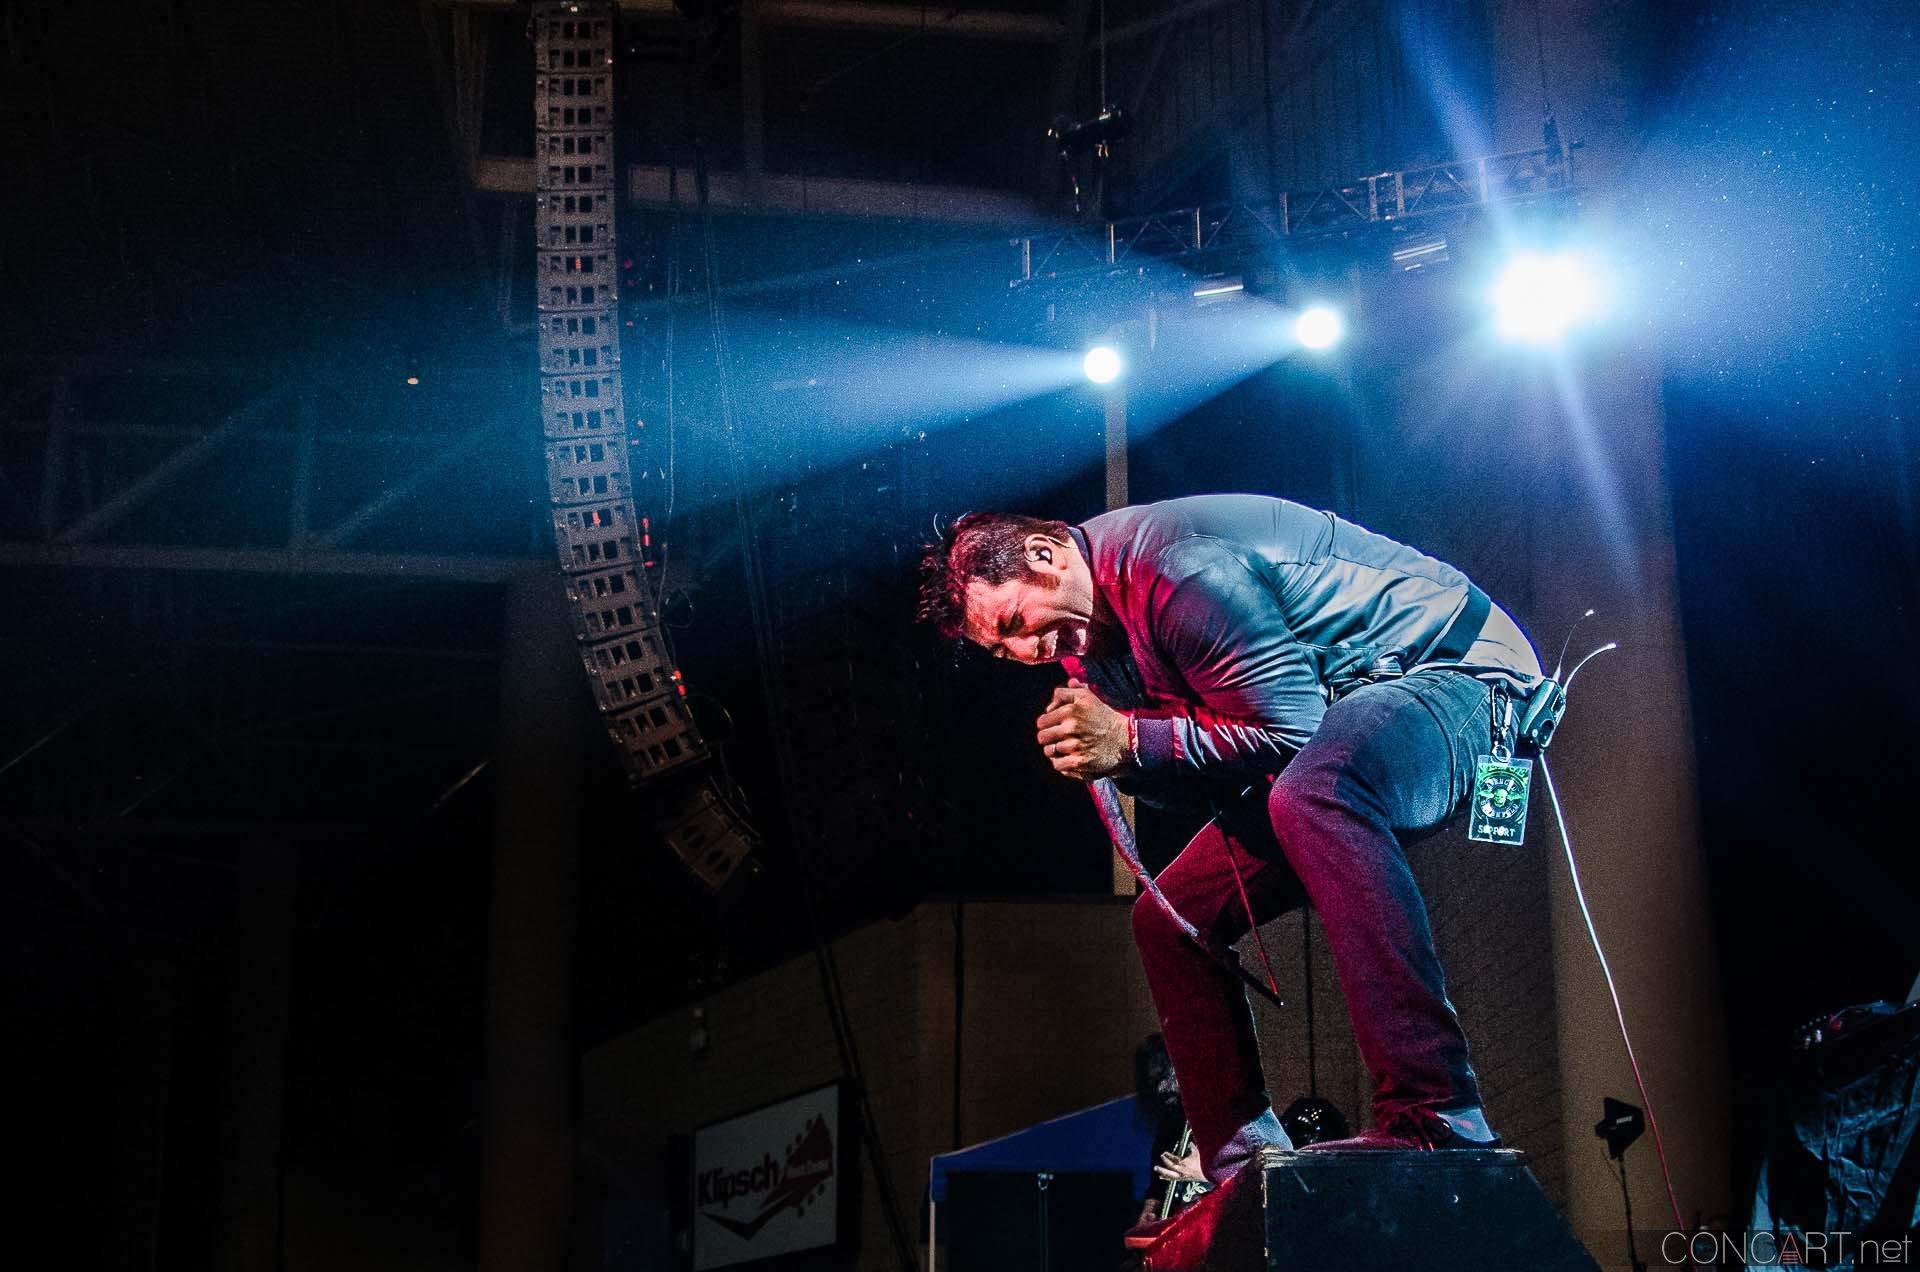 deftones_live_klipsch_music_center_indianapolis_2013-10